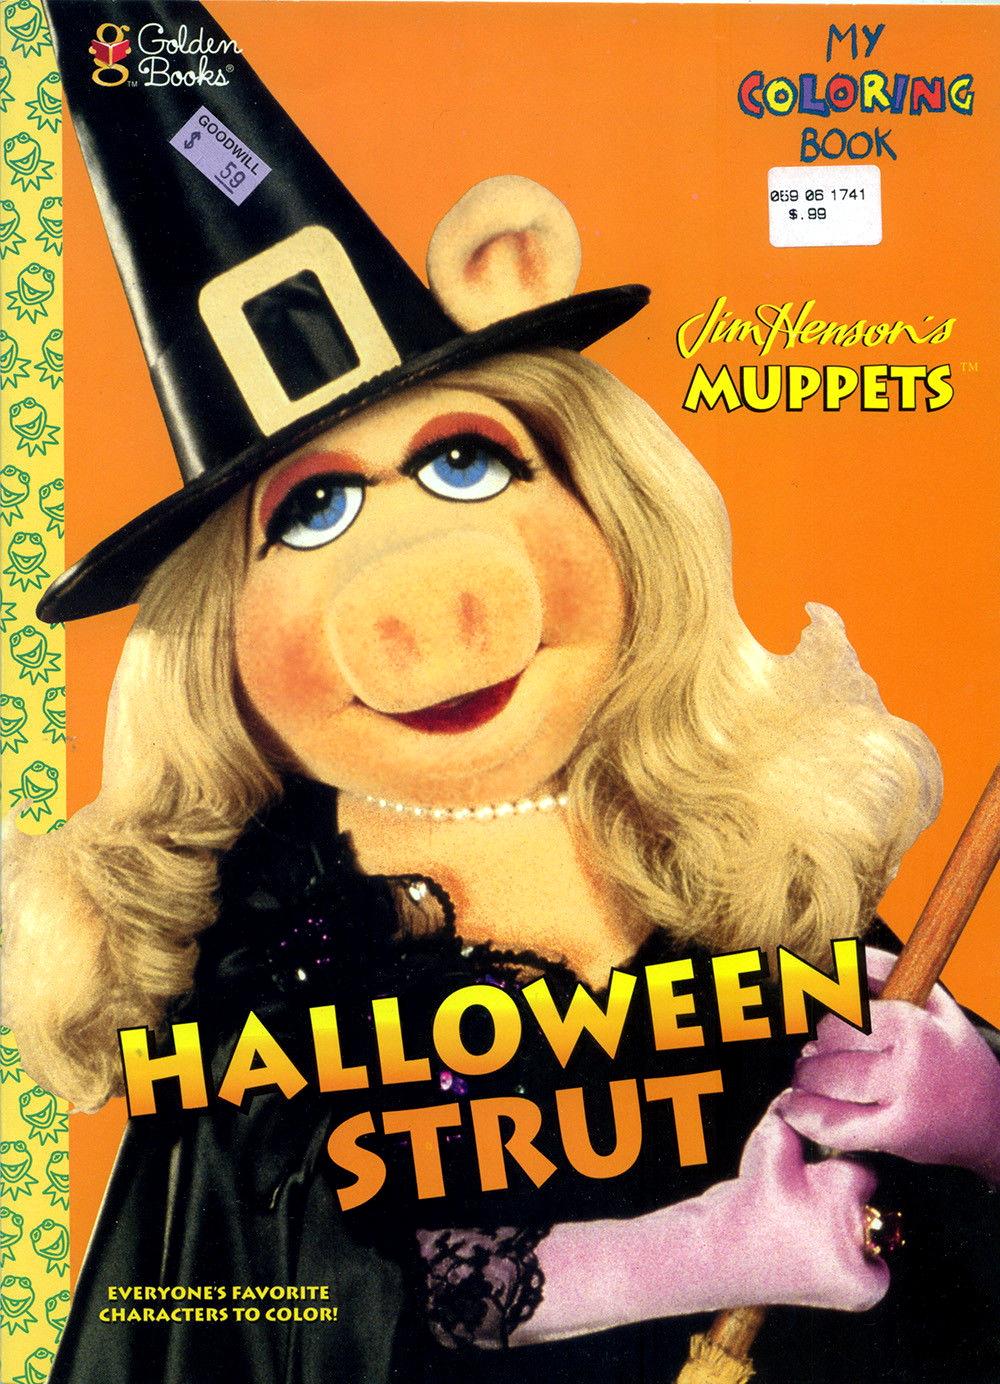 File:Halloweenstrut.JPG